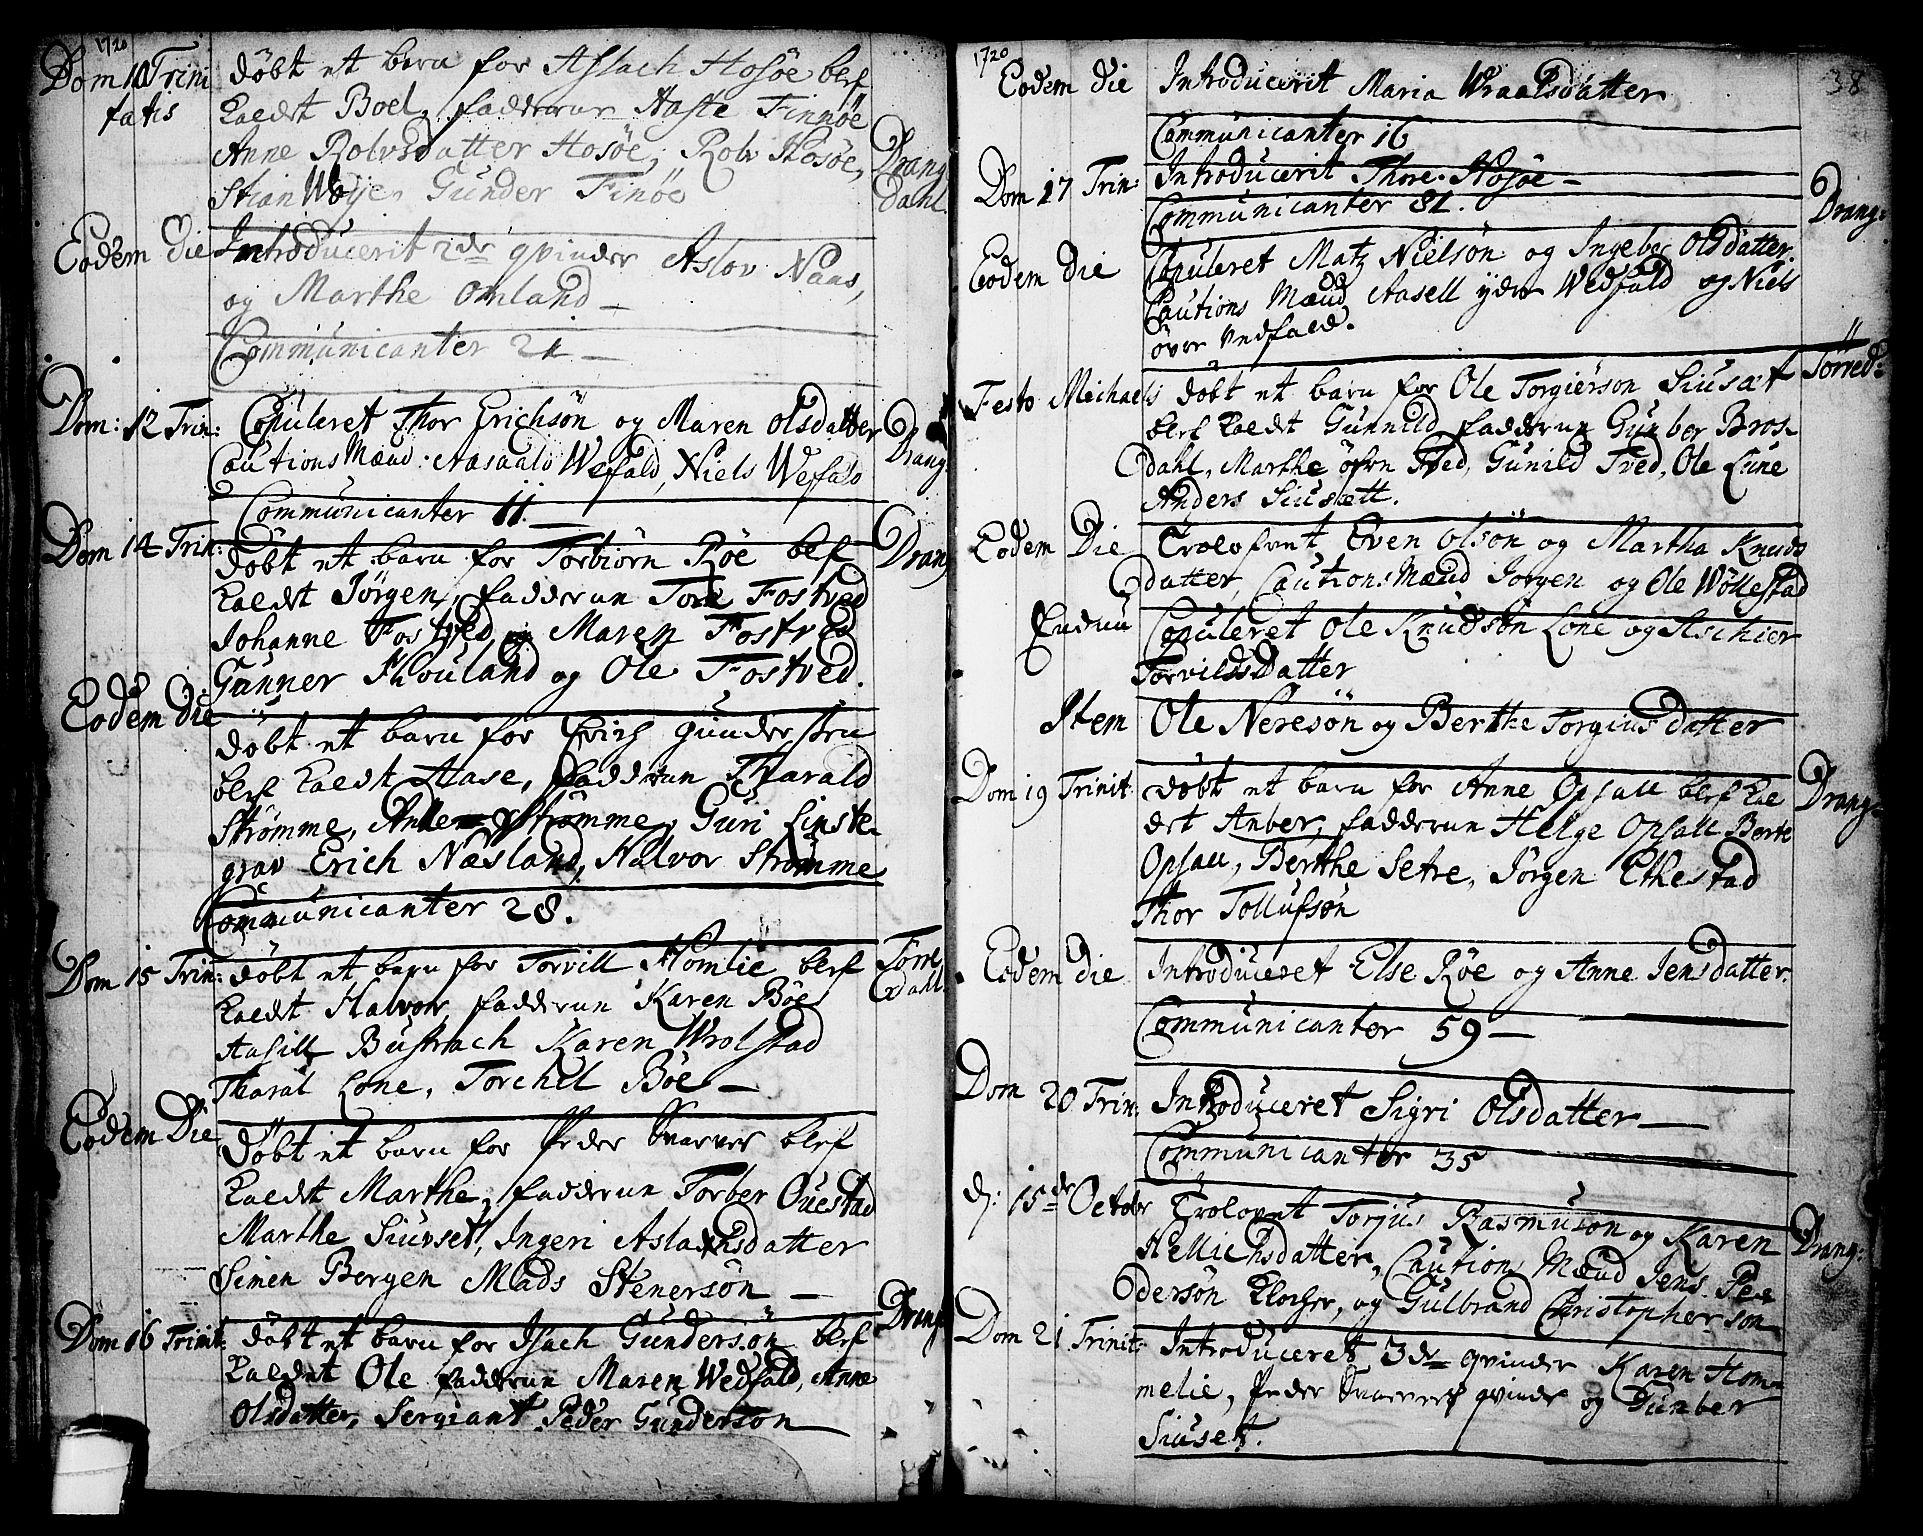 SAKO, Drangedal kirkebøker, F/Fa/L0001: Ministerialbok nr. 1, 1697-1767, s. 38